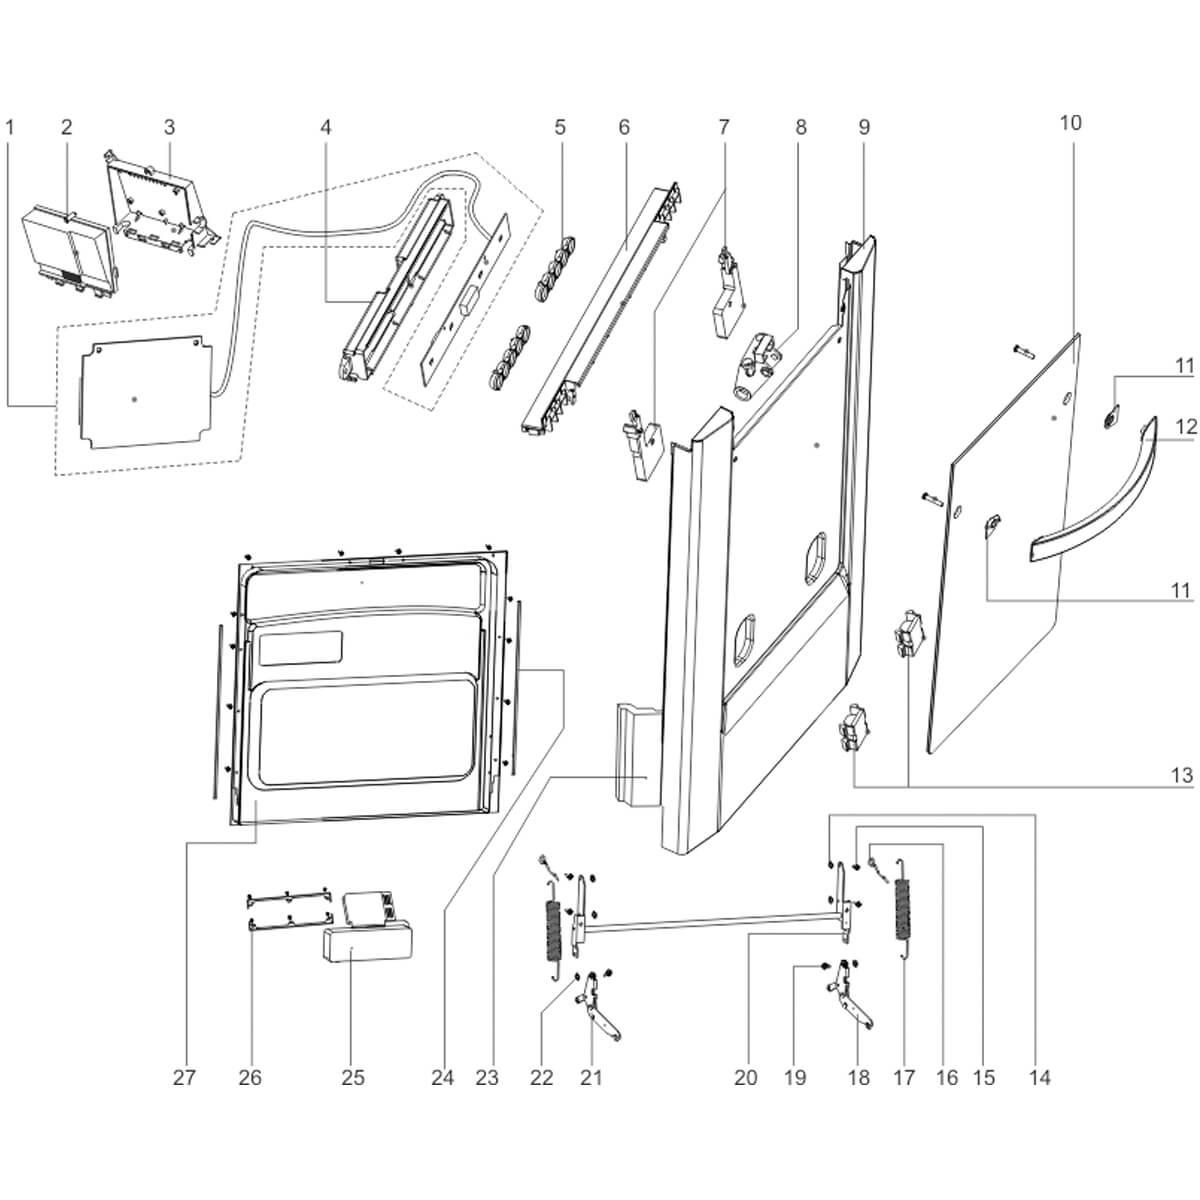 Placa Principal Para Lavadora De Louças Electrolux LE09B LE09X - 674001001436